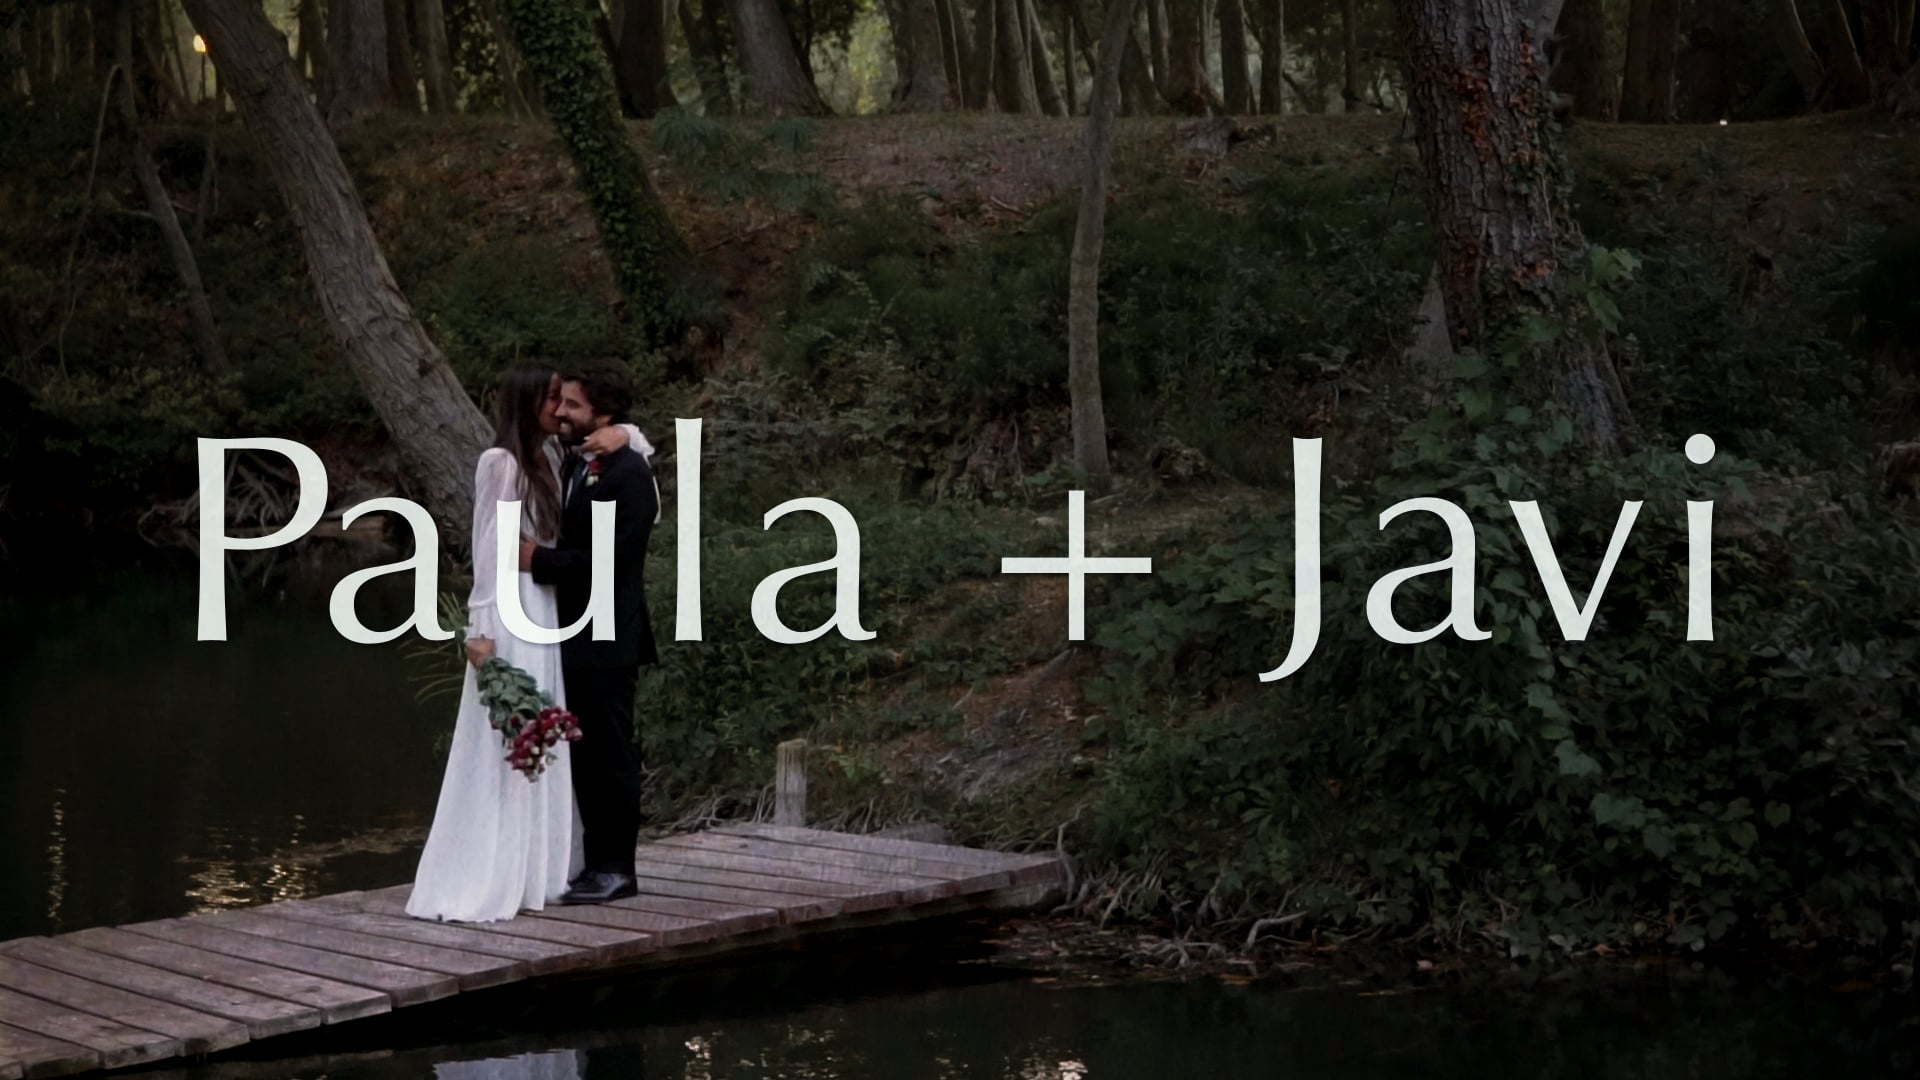 Paula & Javi - La película